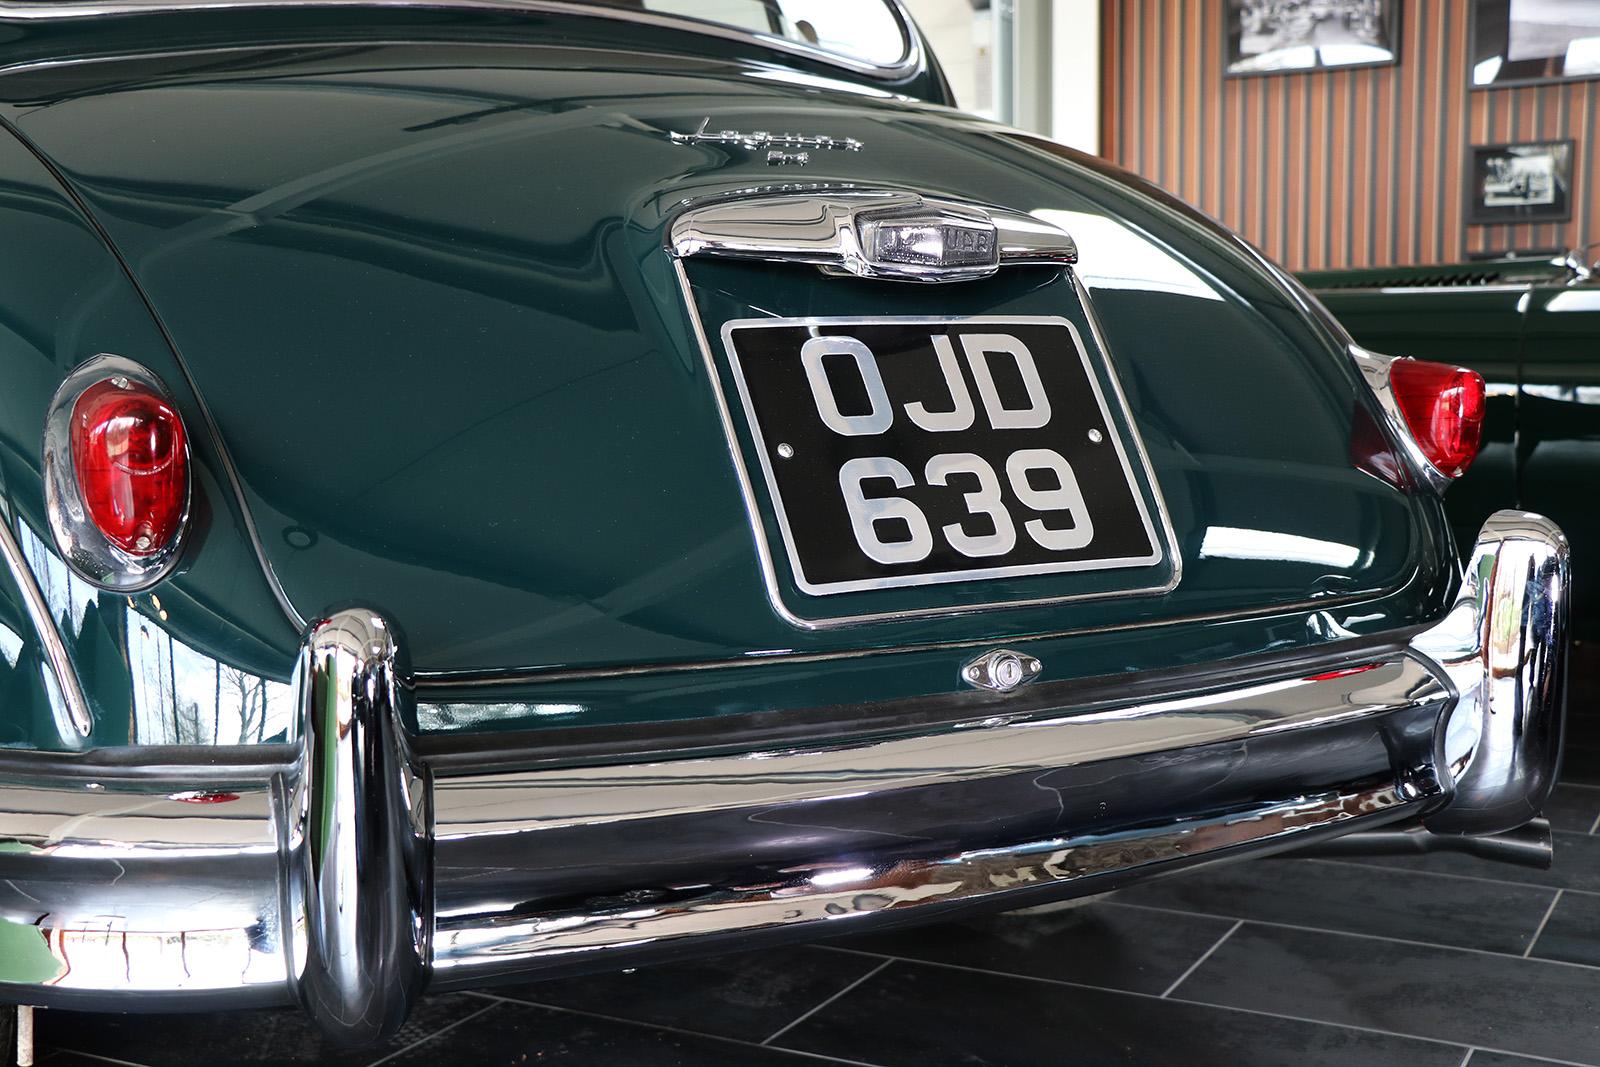 1959_Jaguar_Mark 1_sayer selection_duncan hamilton_lady cheatham_15_web.jpg